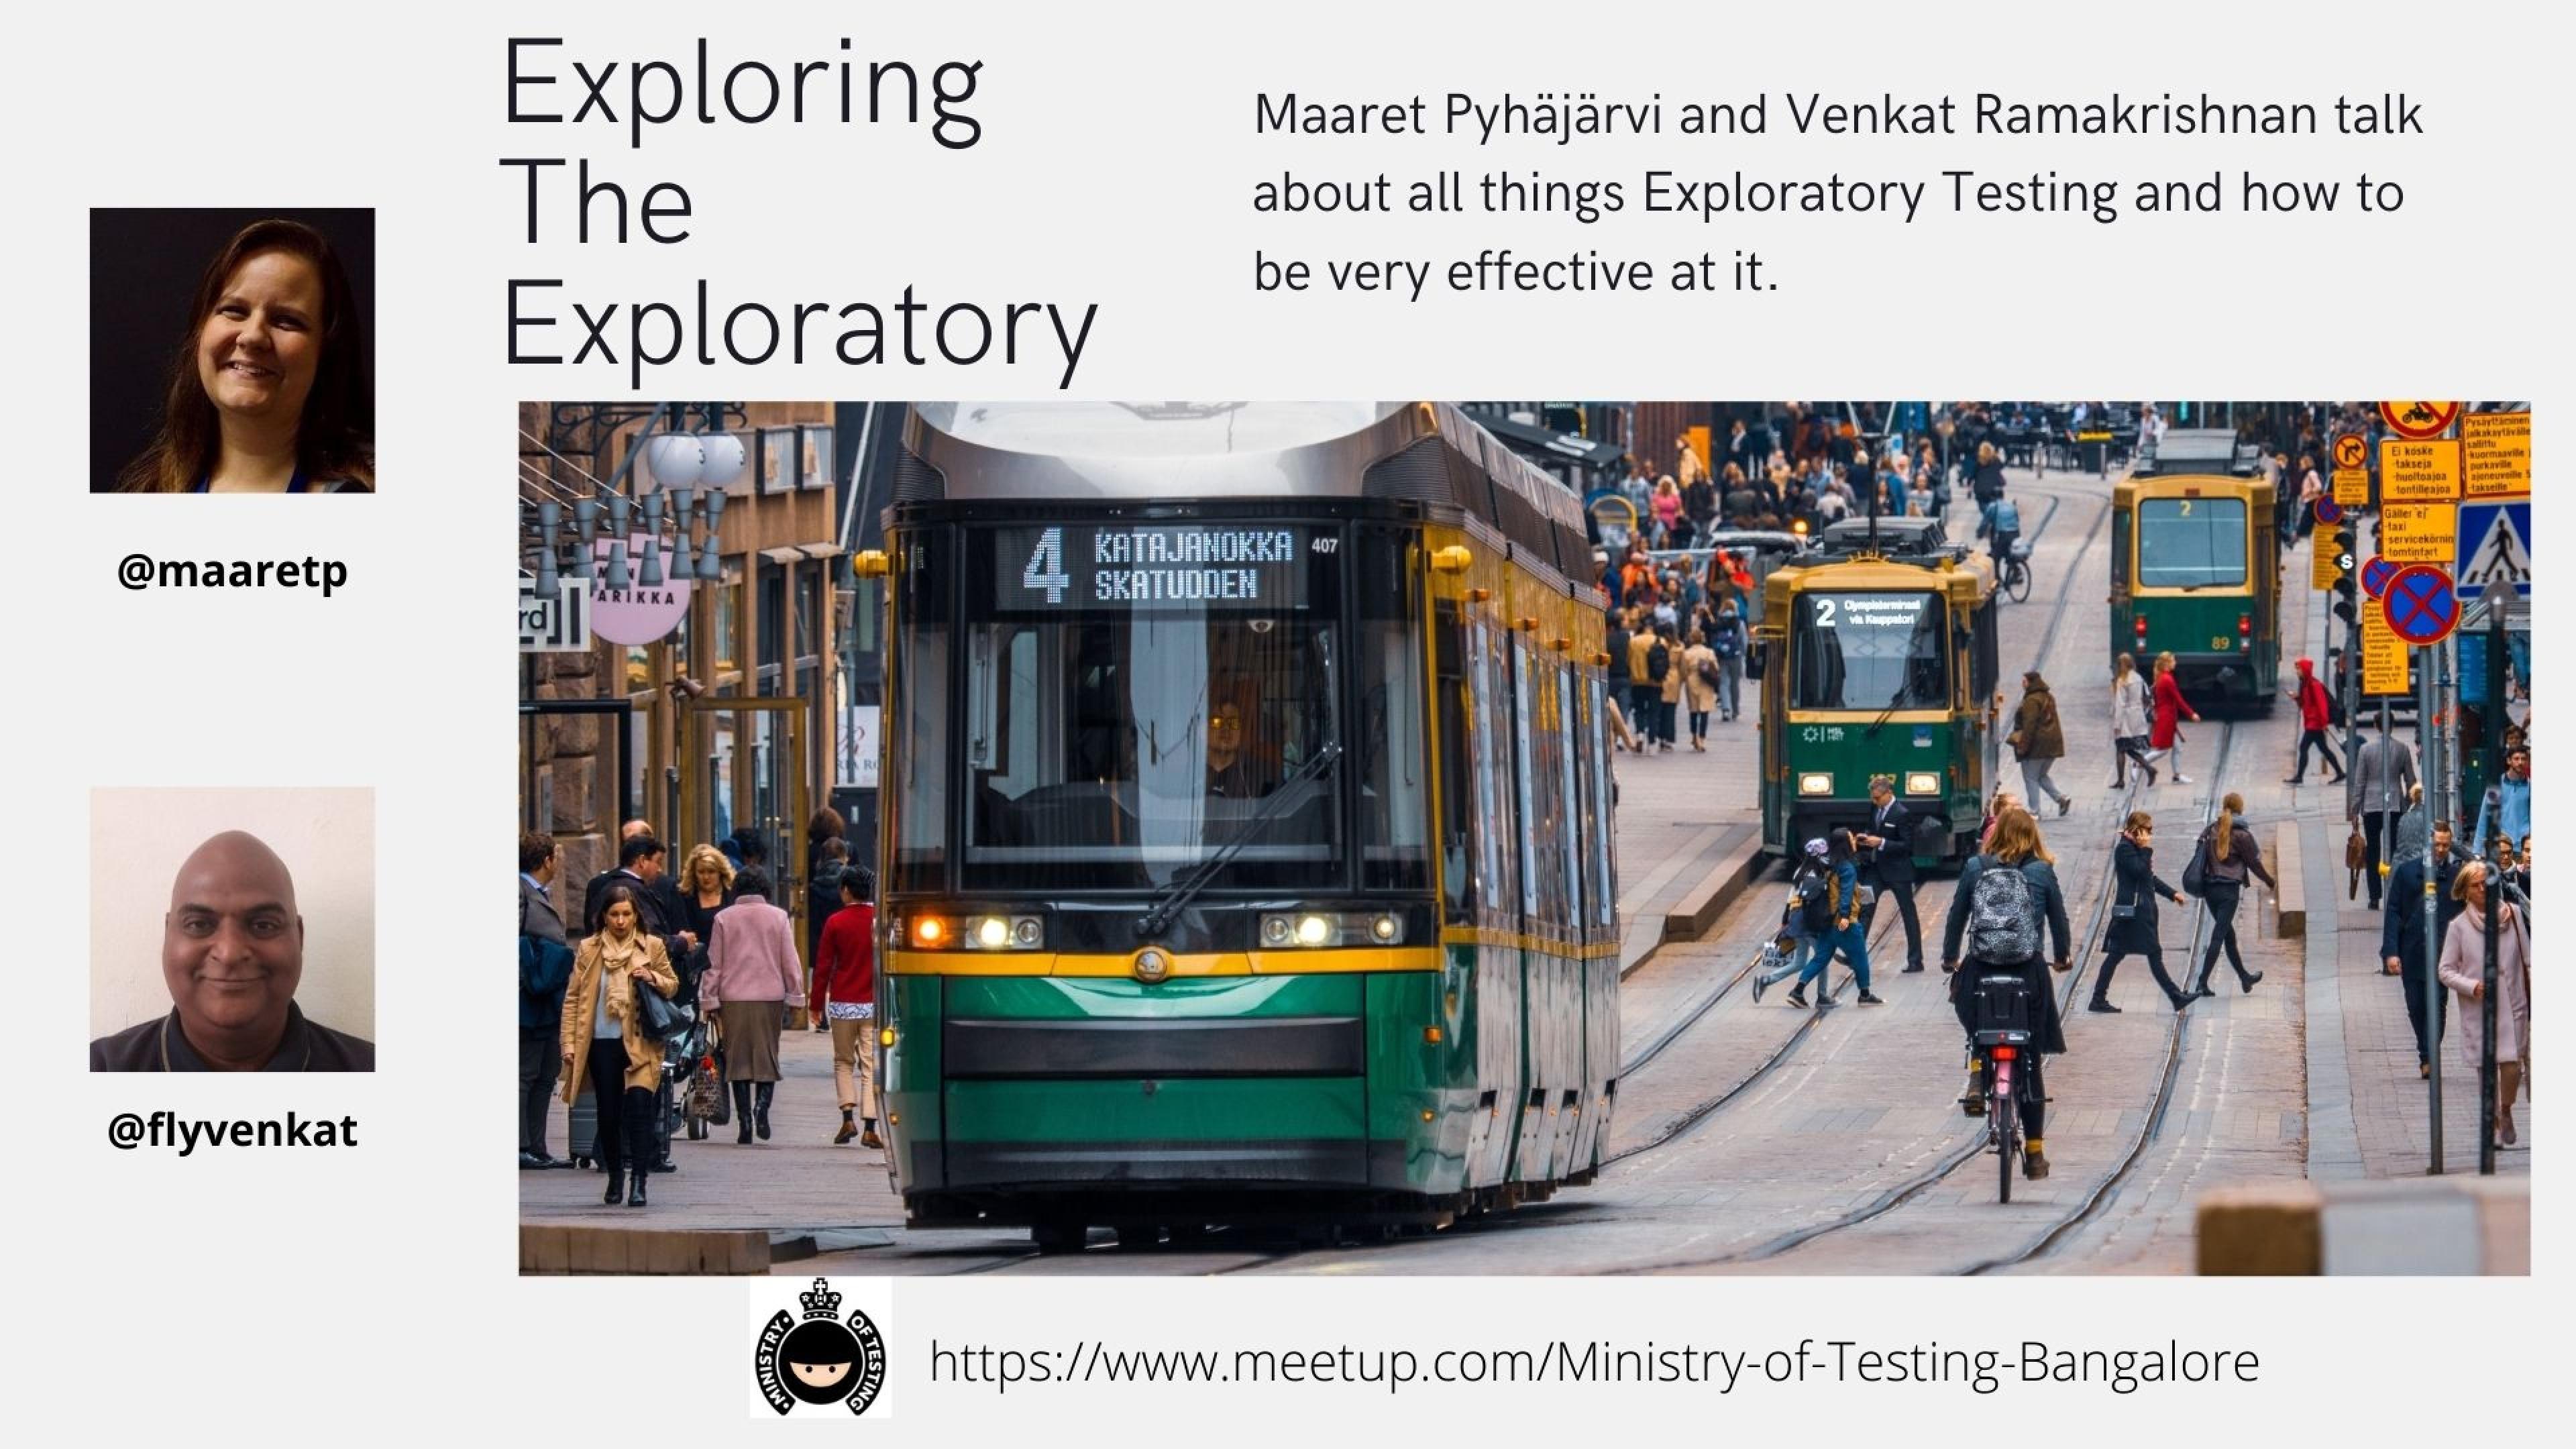 Exploring the Exploratory with Maaret Pyhäjärvi